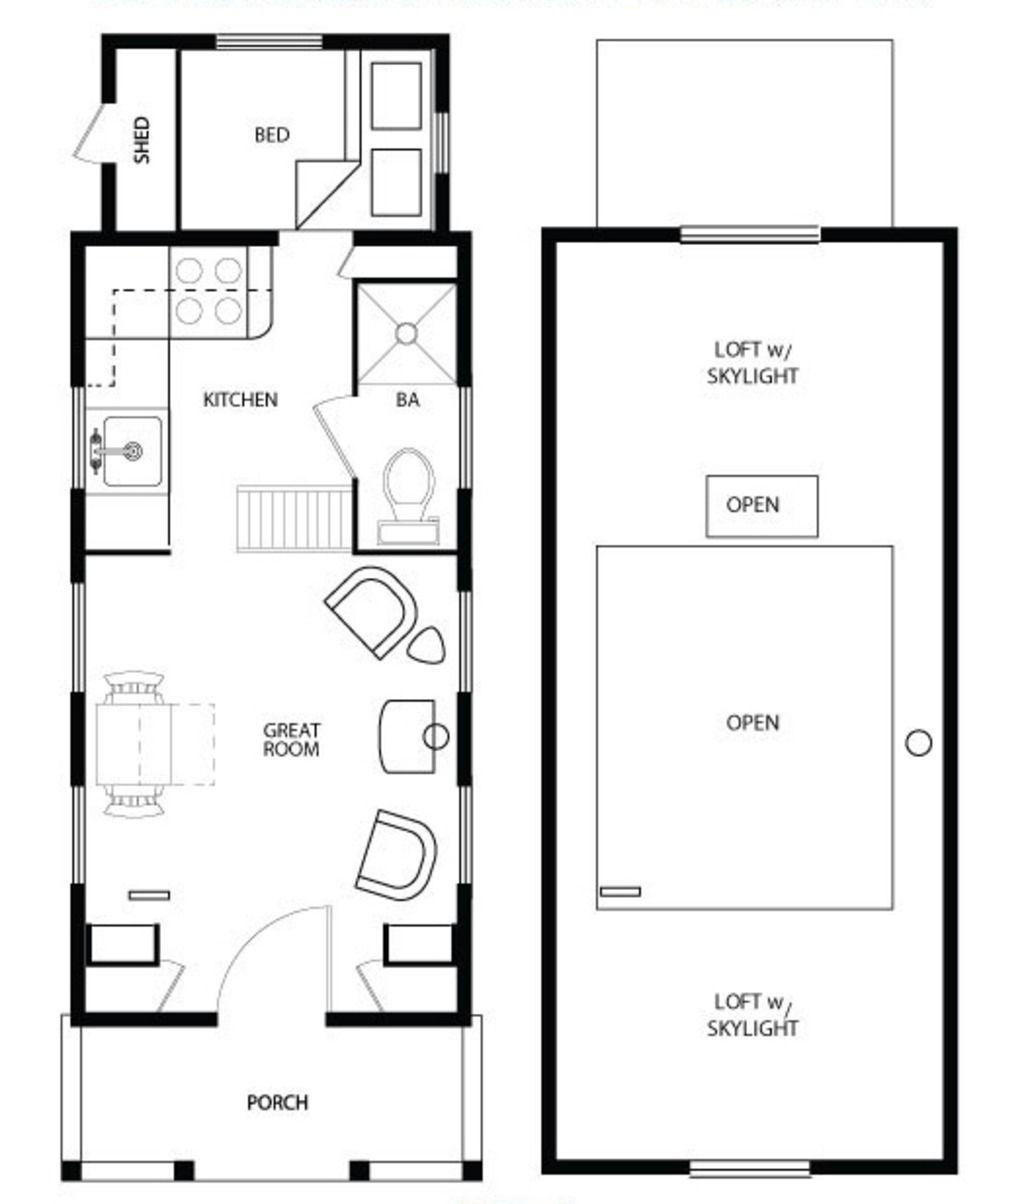 Stupendous 17 Best Images About Tiny House Floor Plans On Pinterest Tiny Largest Home Design Picture Inspirations Pitcheantrous